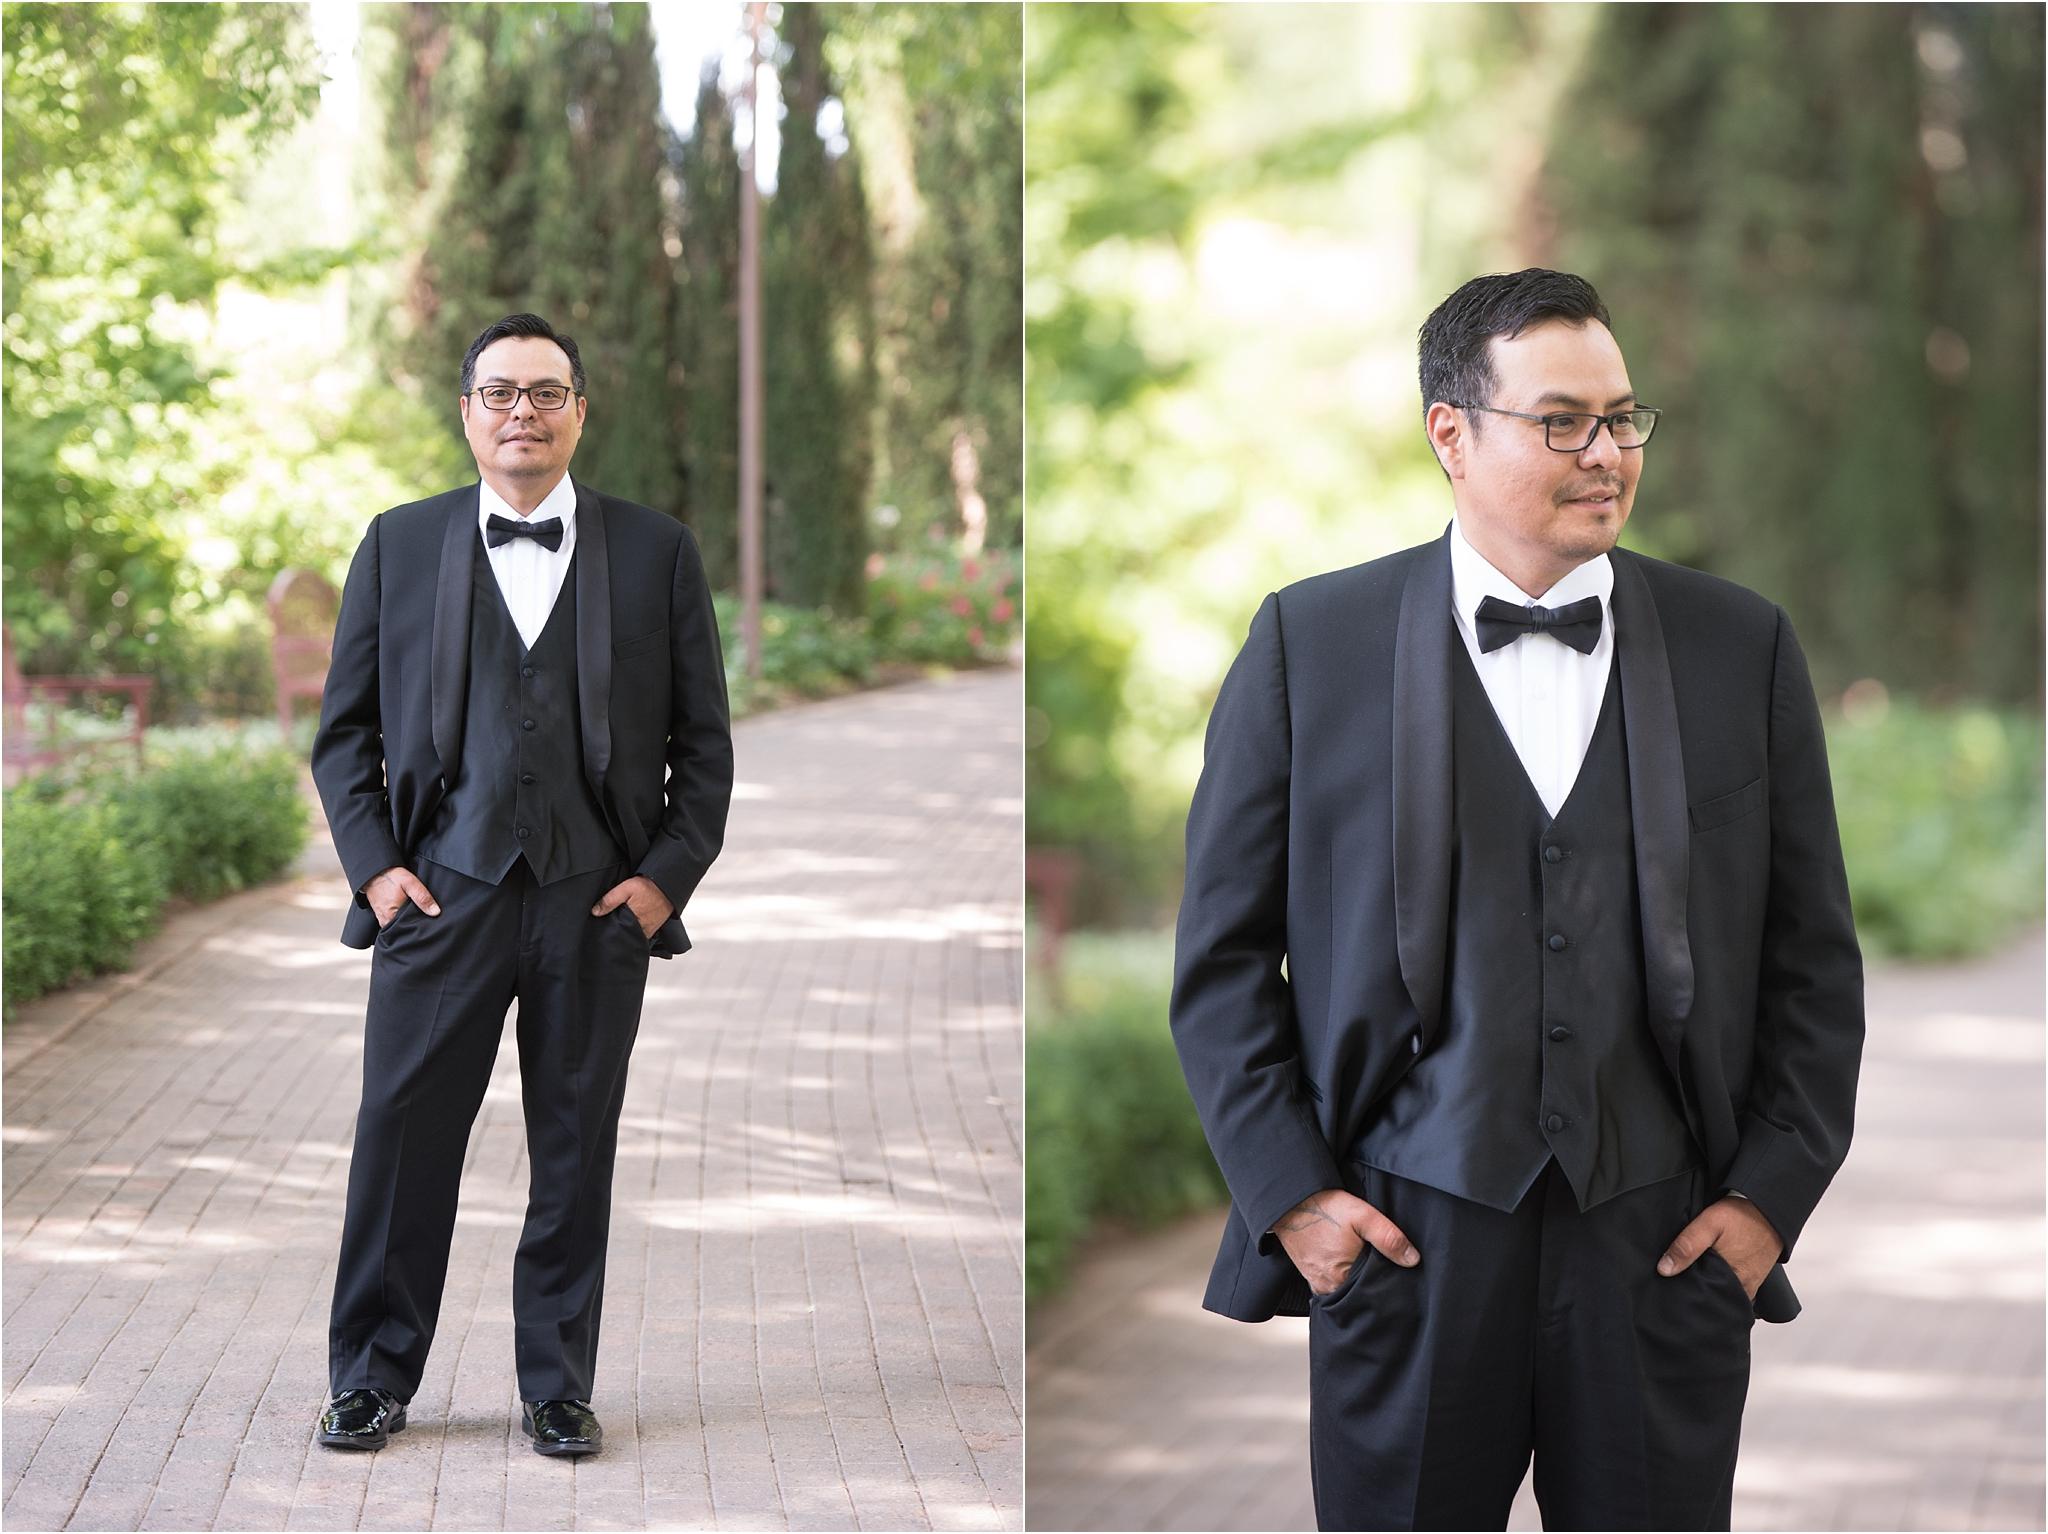 kayla kitts photography - albuquerque botanical gardens - albuquerque wedding photographer - albuquerque wedding - the banque lofts wedding_0001.jpg